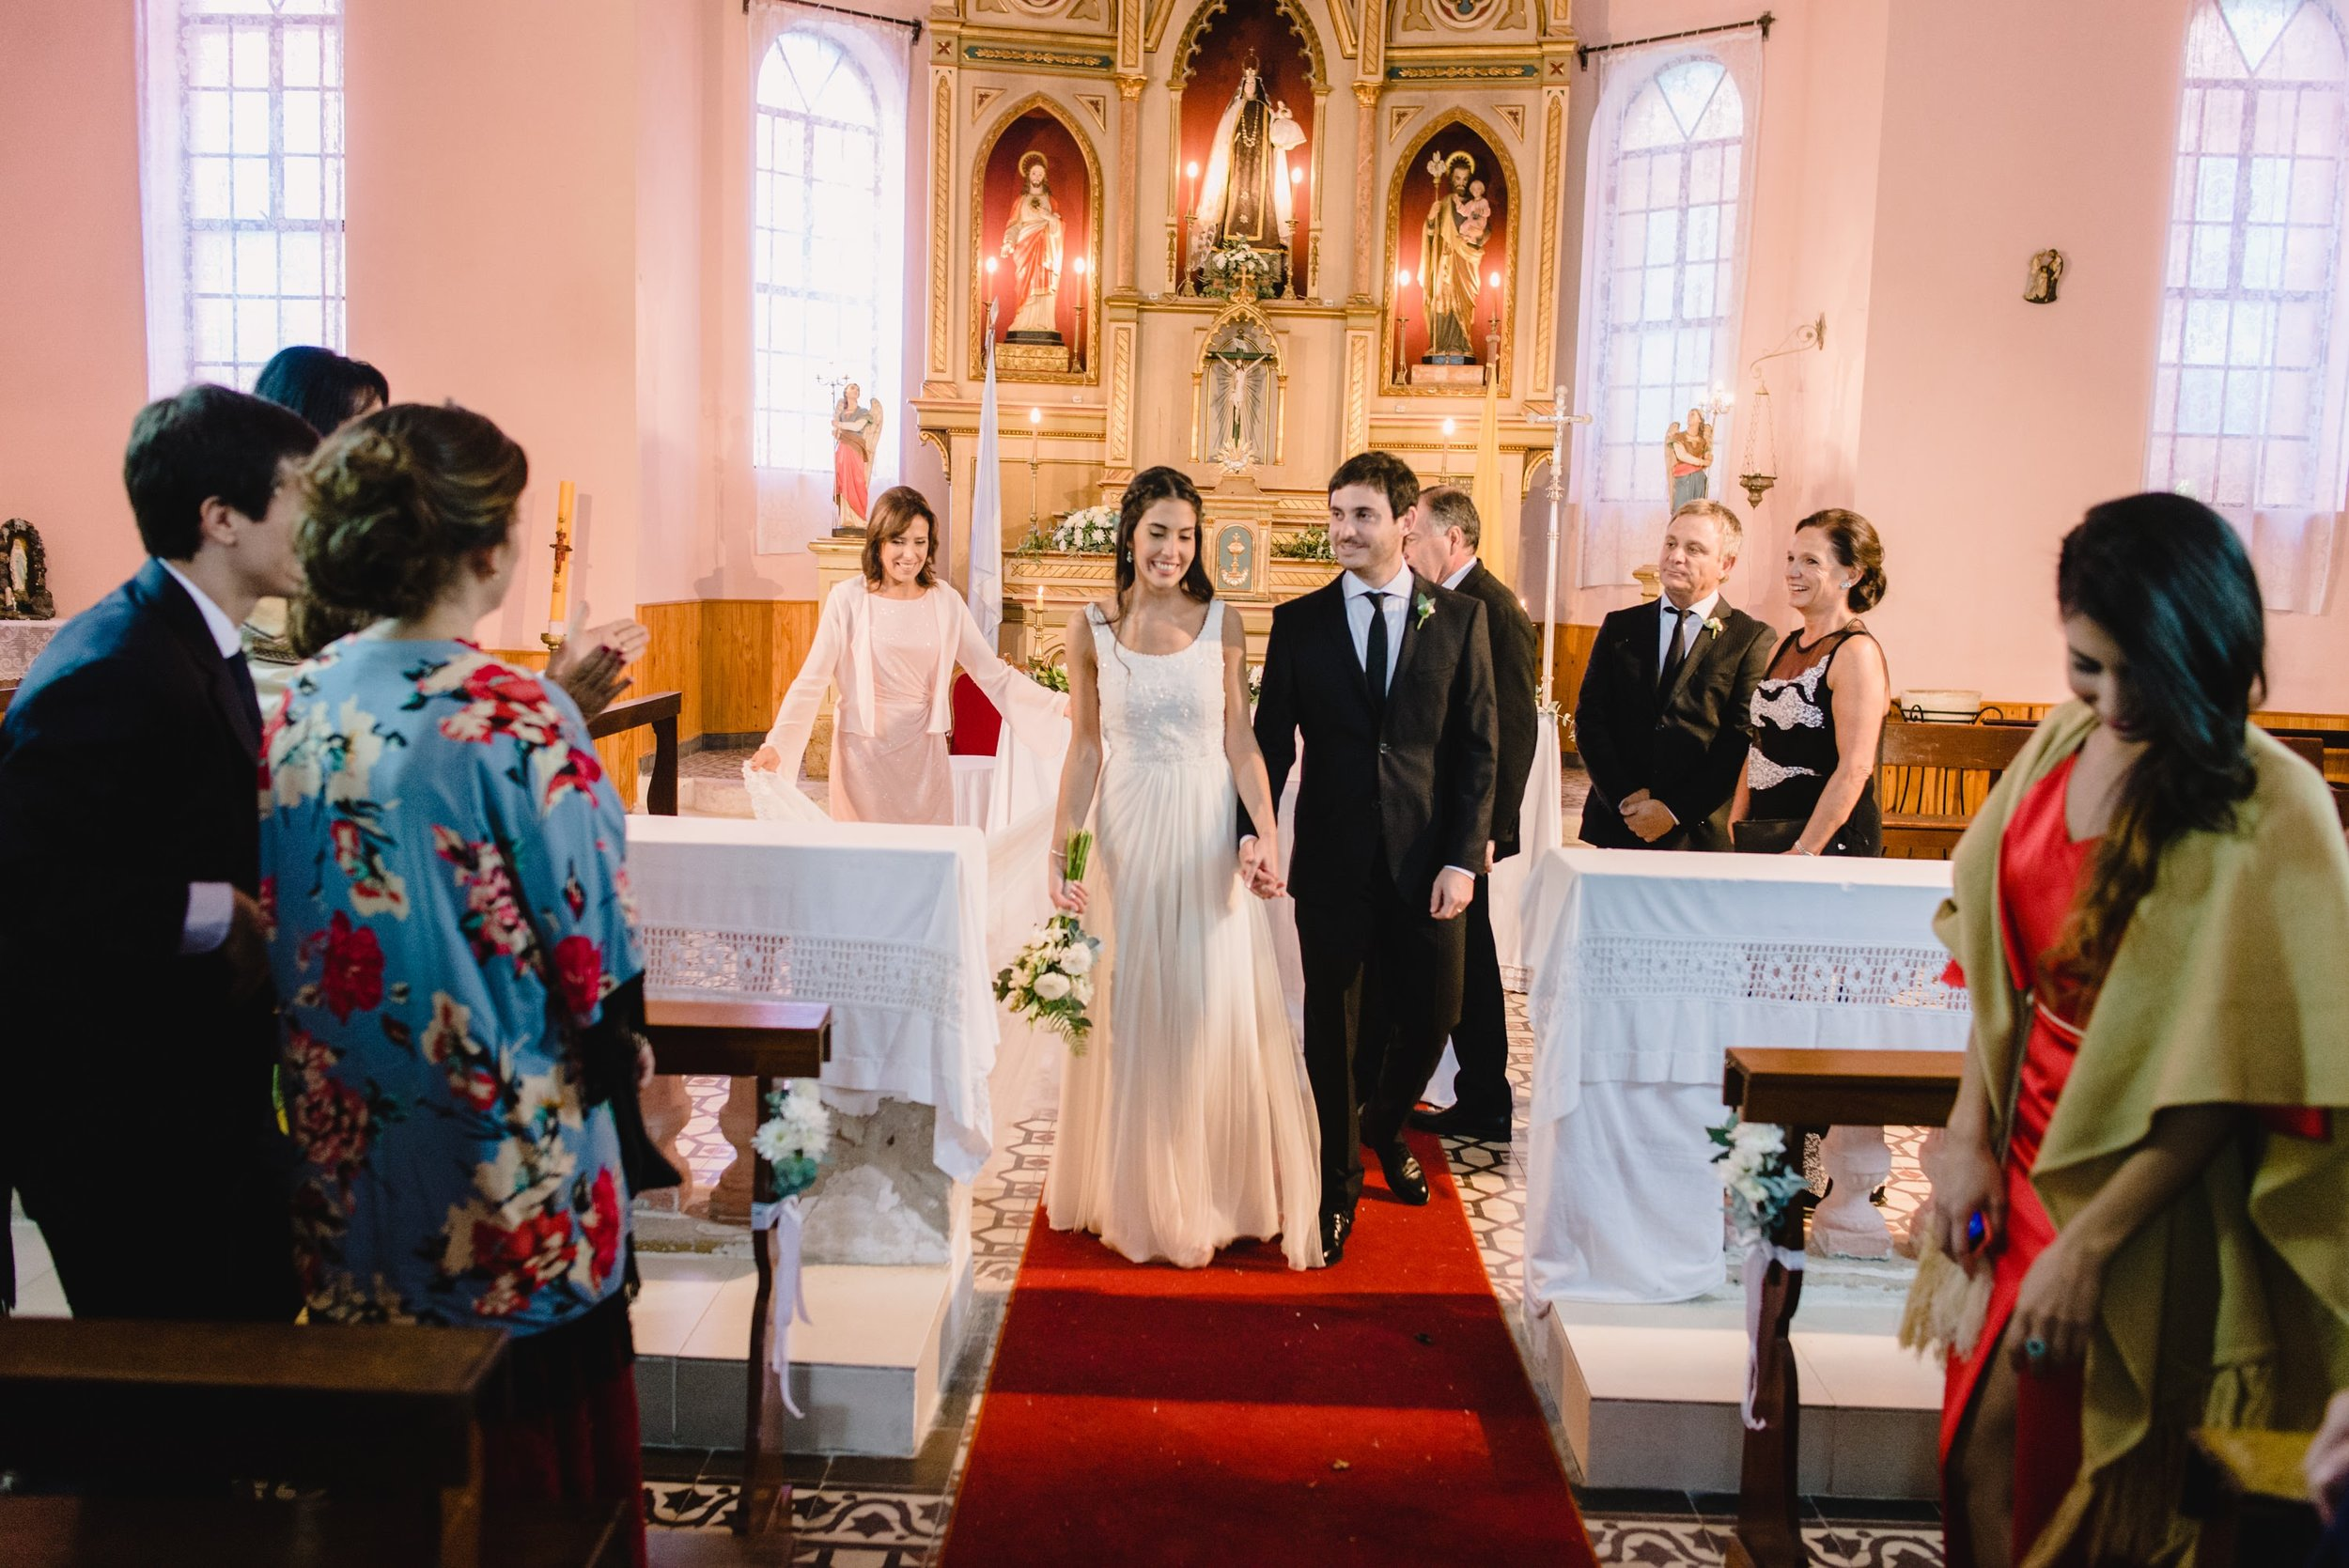 fotografo de bodas en carlos paz cordoba 035.JPG